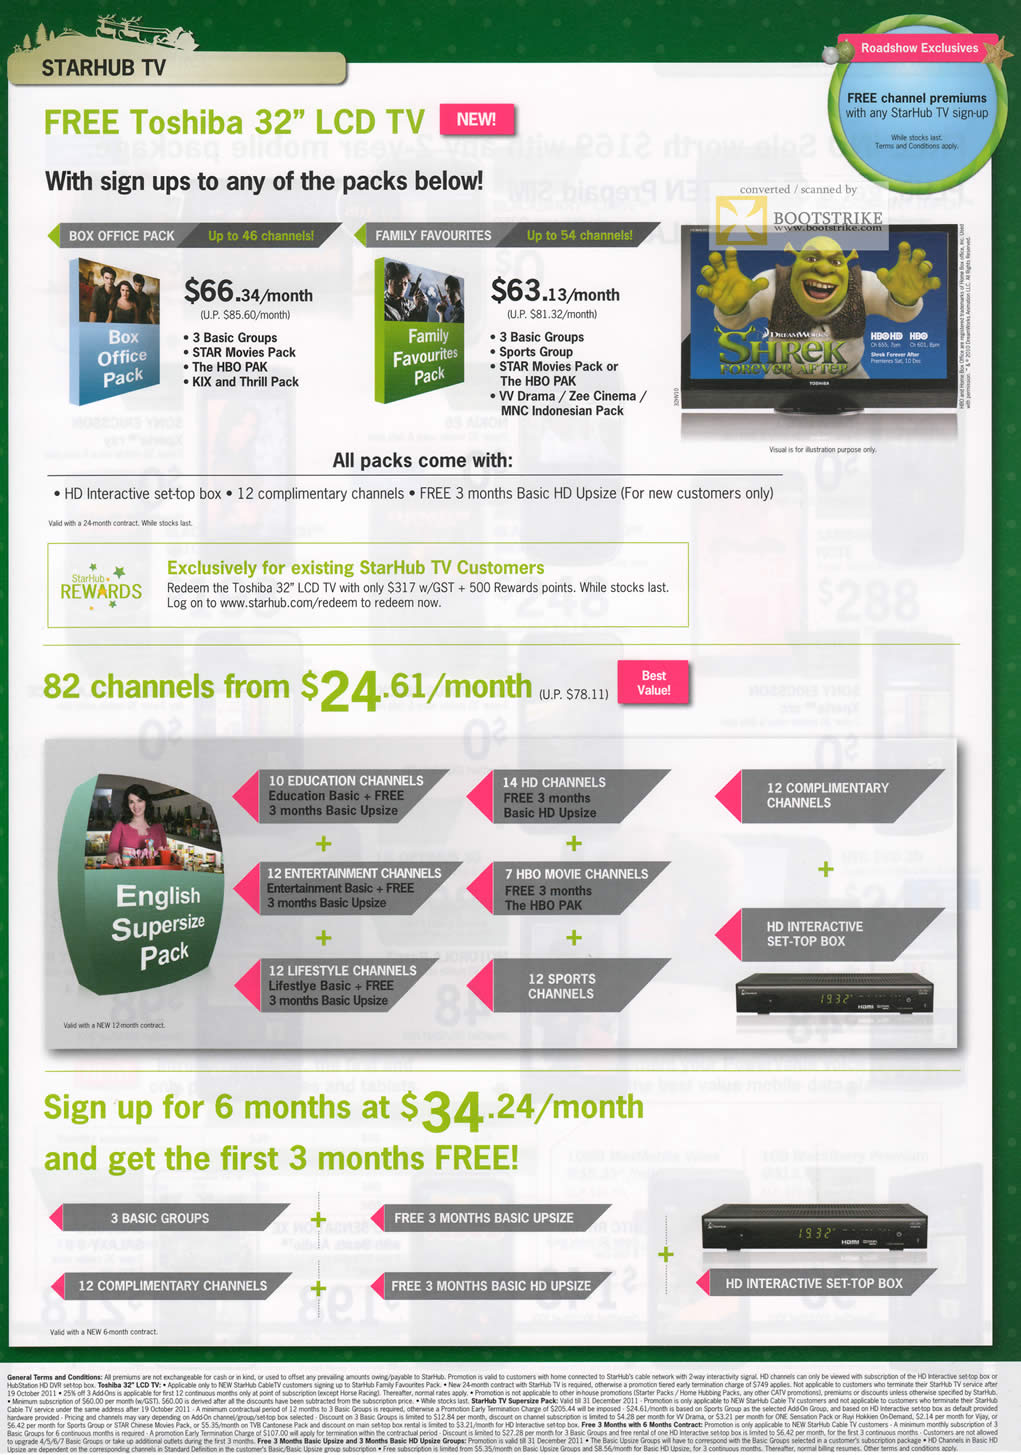 SITEX 2011 price list image brochure of Starhub TV Free Toshiba LCD TV, English Supersize Pack, Basic Upsize, Groups